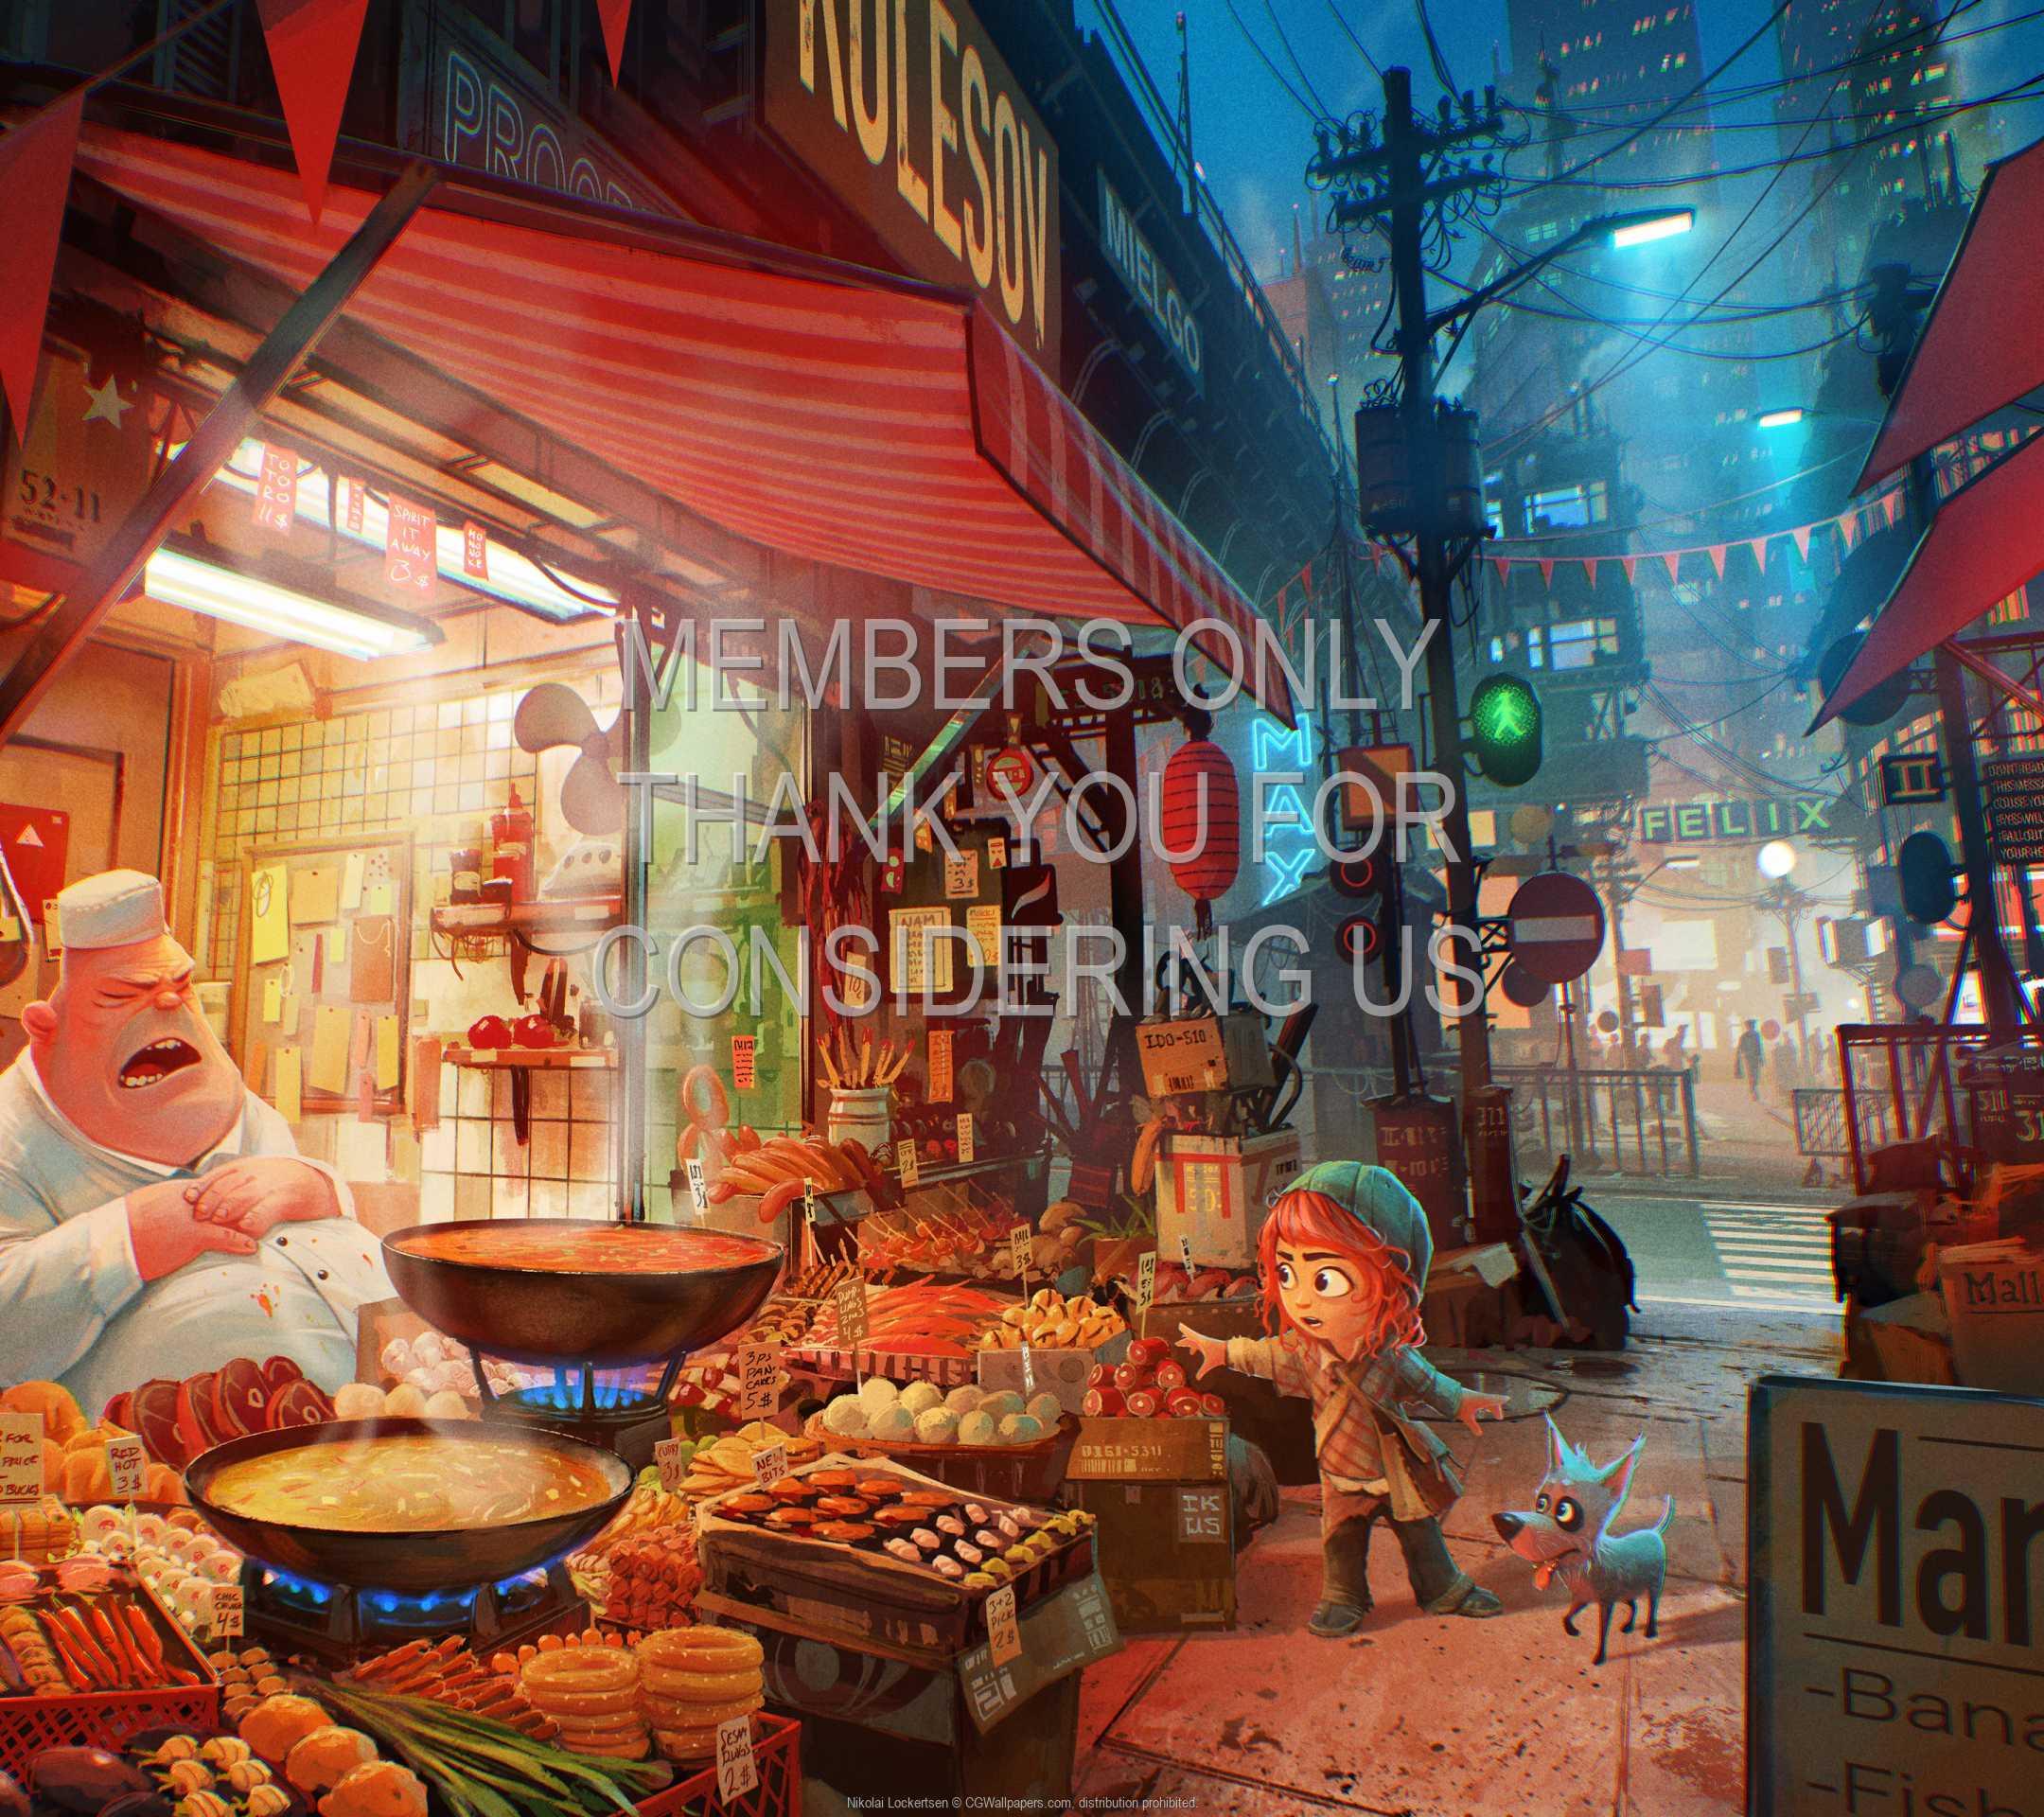 Nikolai Lockertsen 1080p Horizontal Mobile wallpaper or background 17